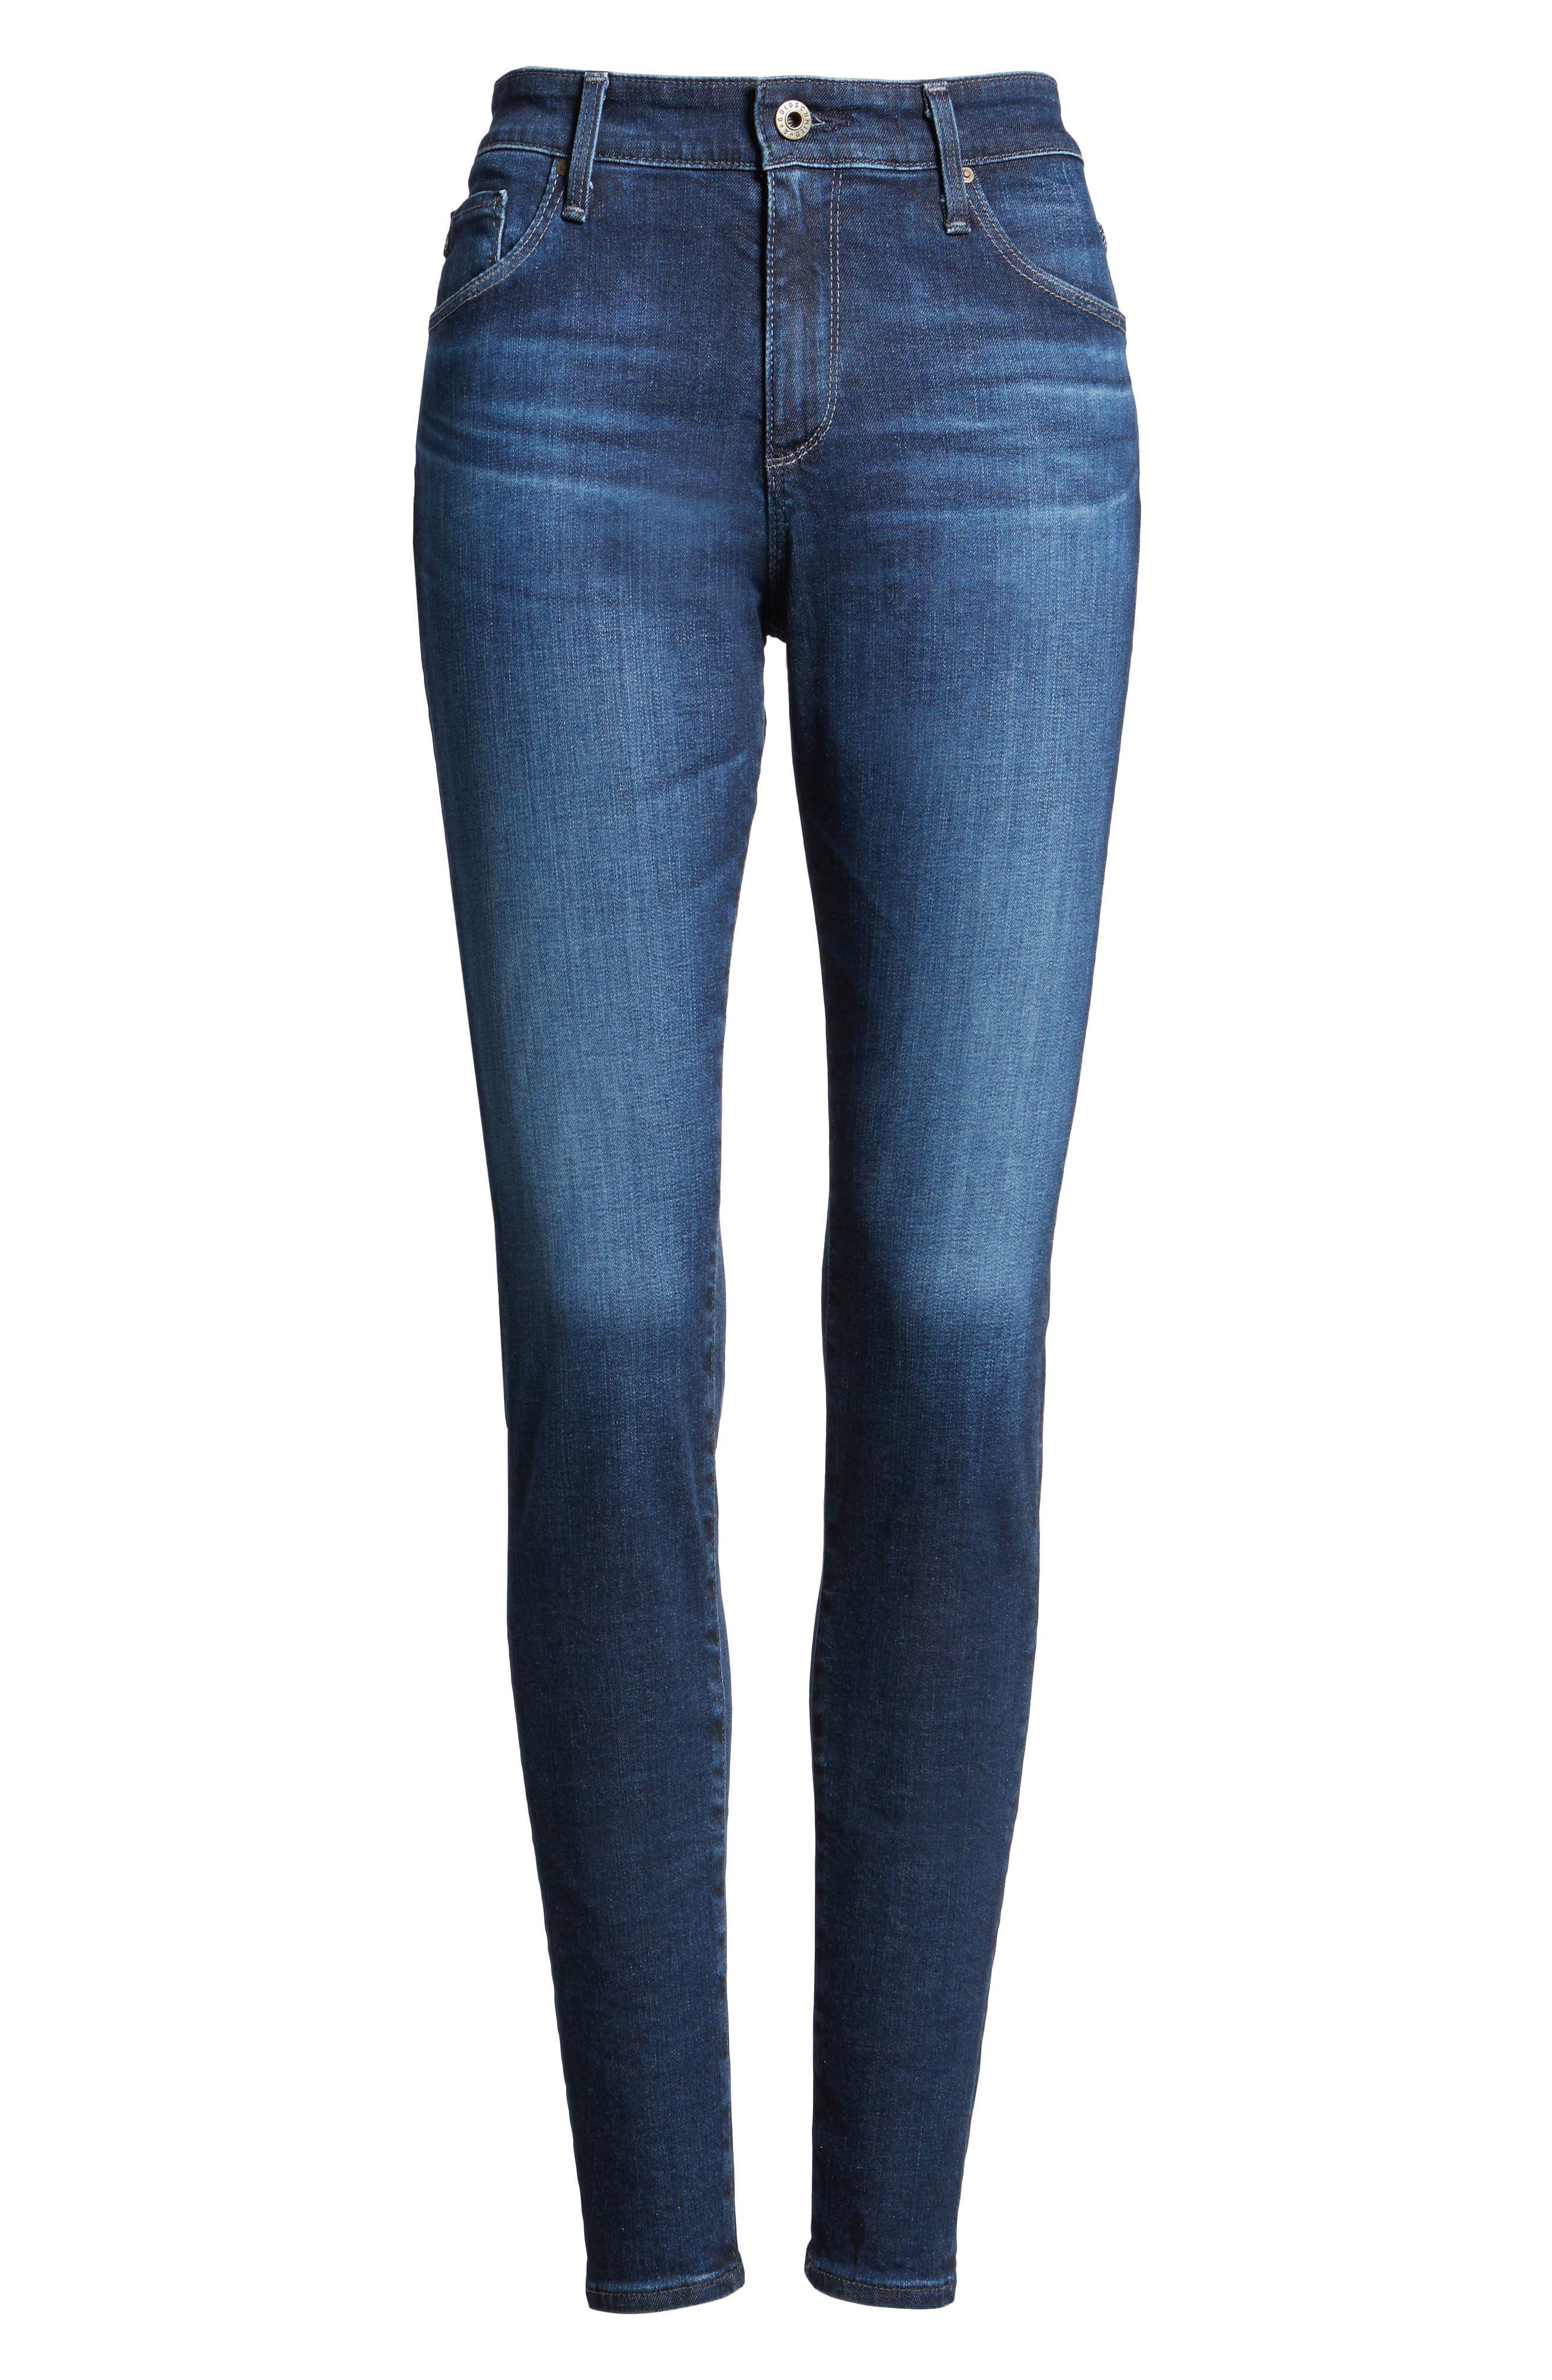 'The Farrah' High Rise Skinny Jeans,                             Alternate thumbnail 54, color,